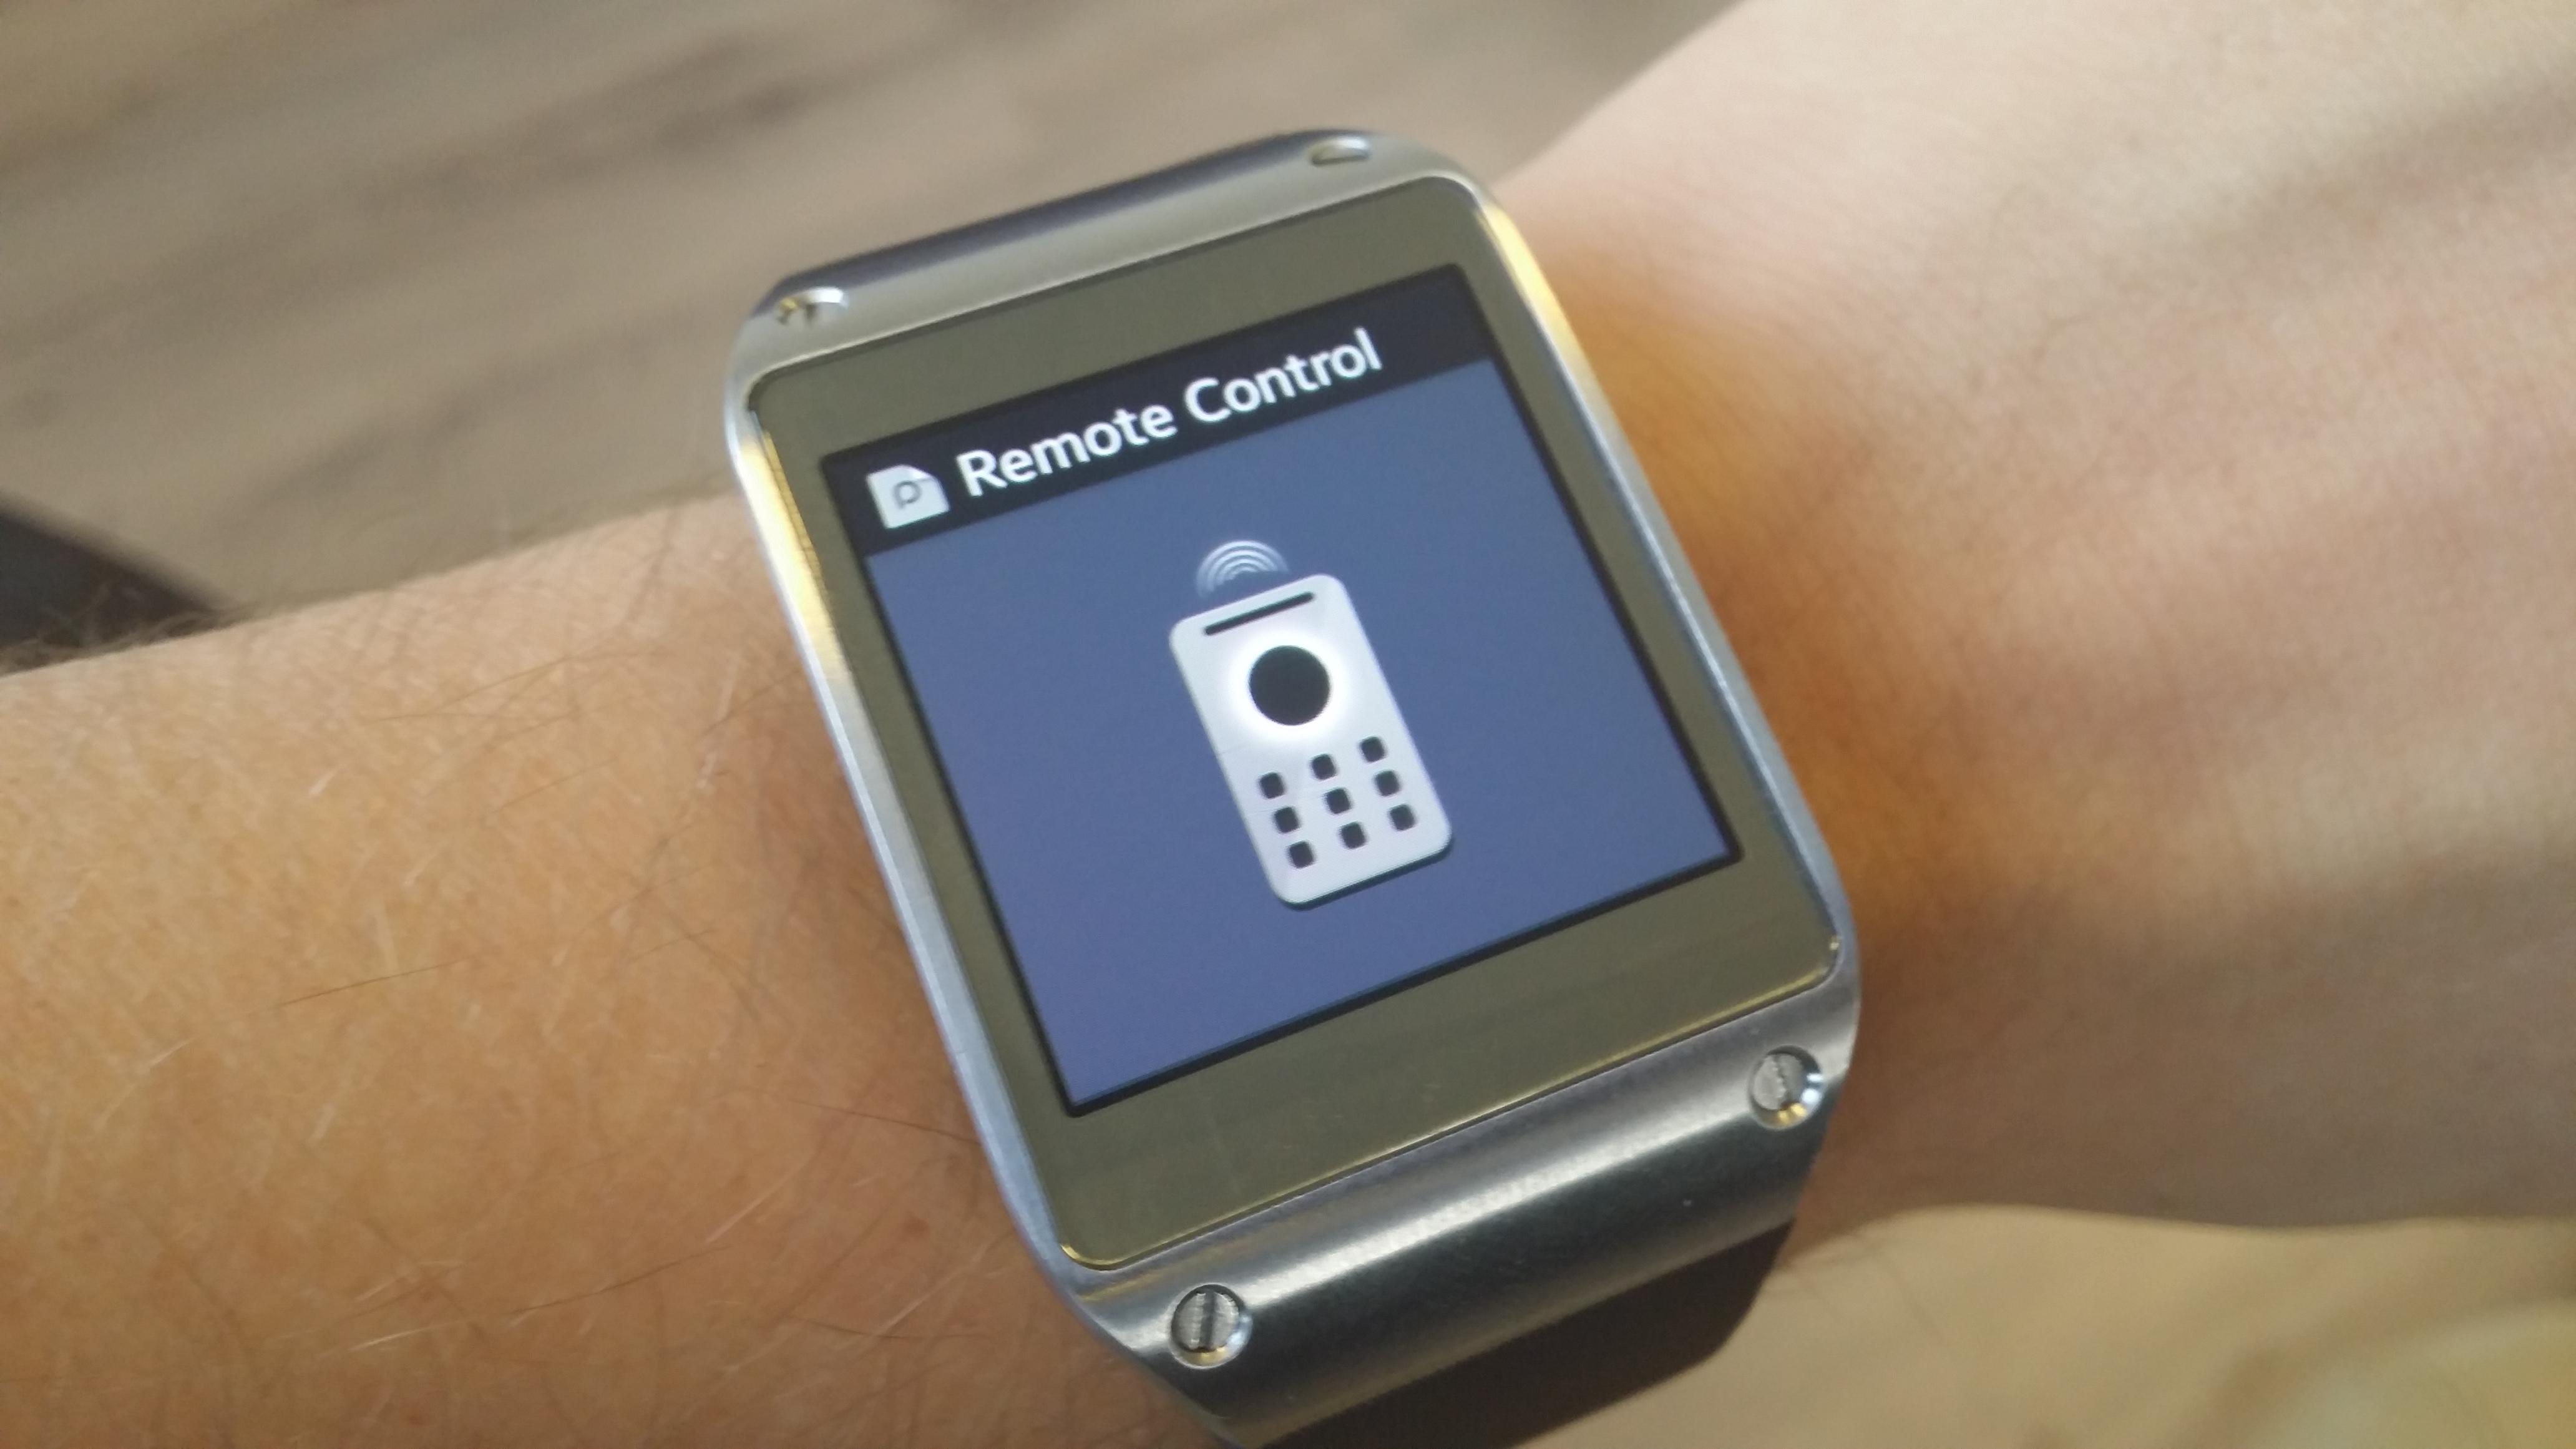 [SOFT][GEAR] : Smart Remote for Galaxy Gear : Télécommande universelle [GRATUIT] Gear-remote-4